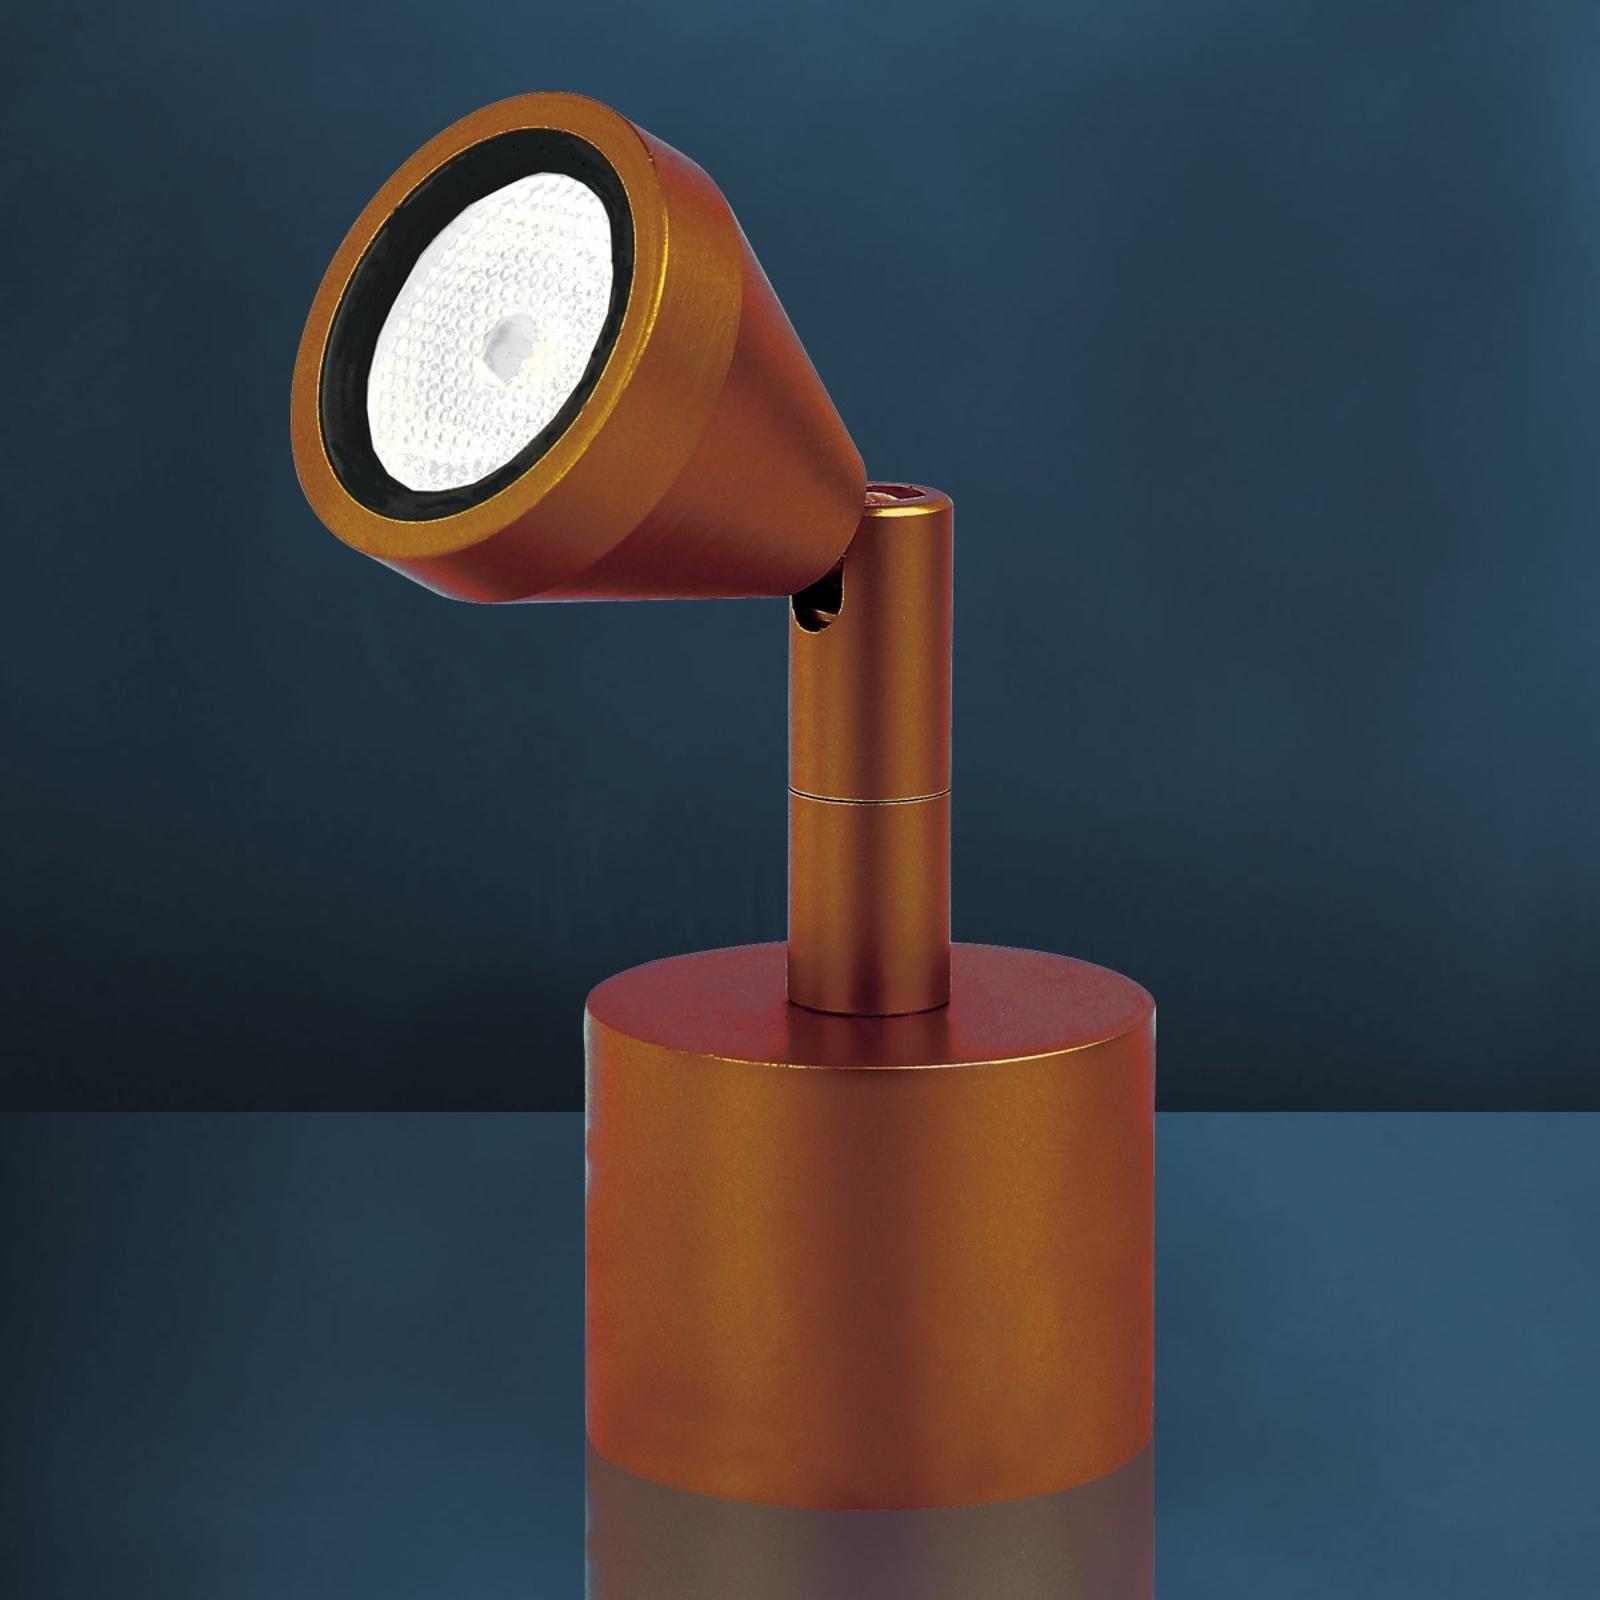 Liten MINI LED-bordlampe med antikk finish